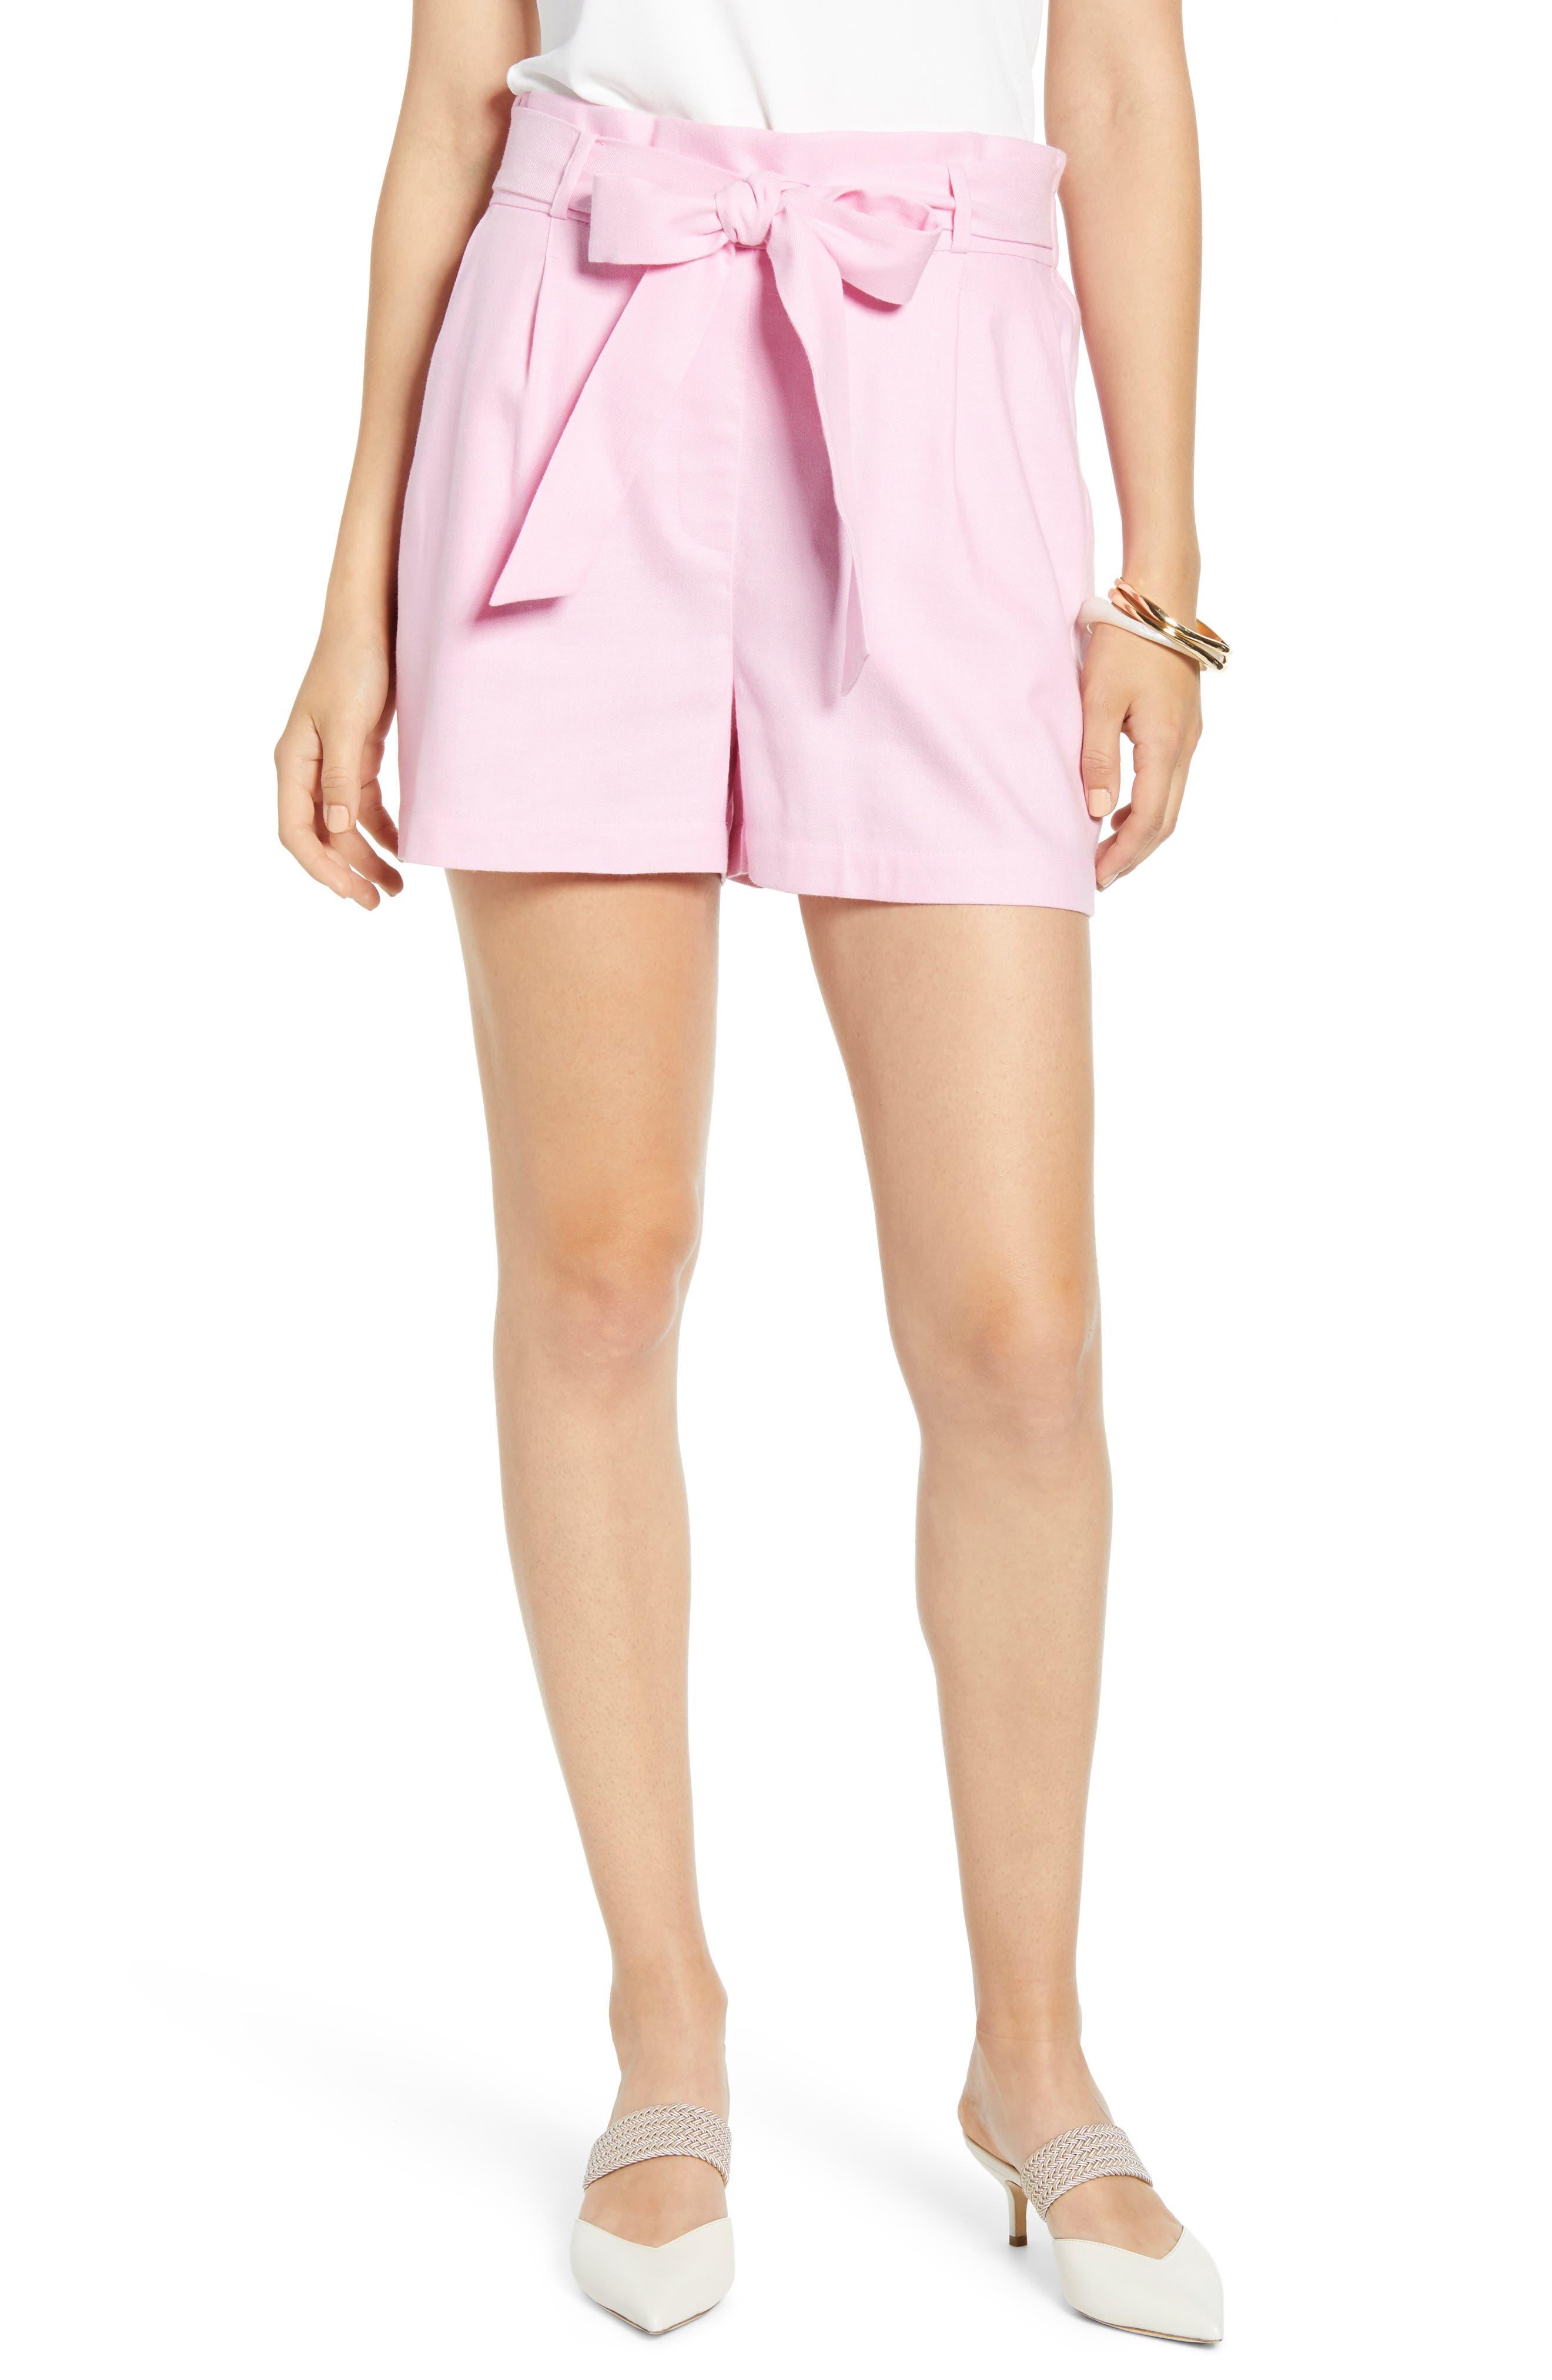 1940s Shorts | High Waisted Shorts | Sailor Shorts Womens Halogen Tie Paperbag Waist Shorts $69.00 AT vintagedancer.com